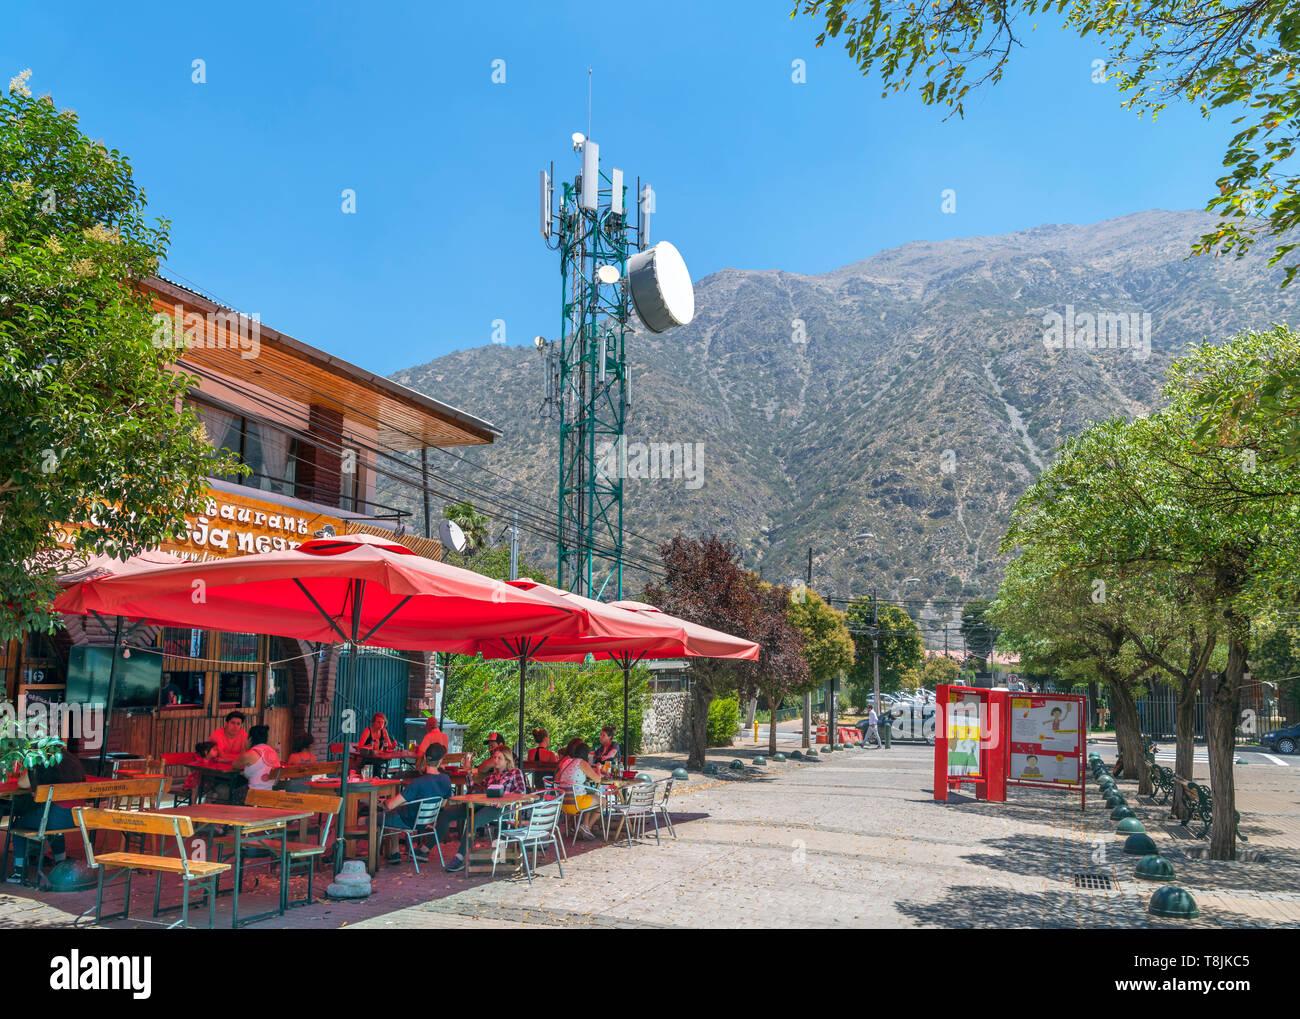 Restaurant next to a mobile phone mast in San Jose de Maipo, Cordillera Province, Chile, South America - Stock Image